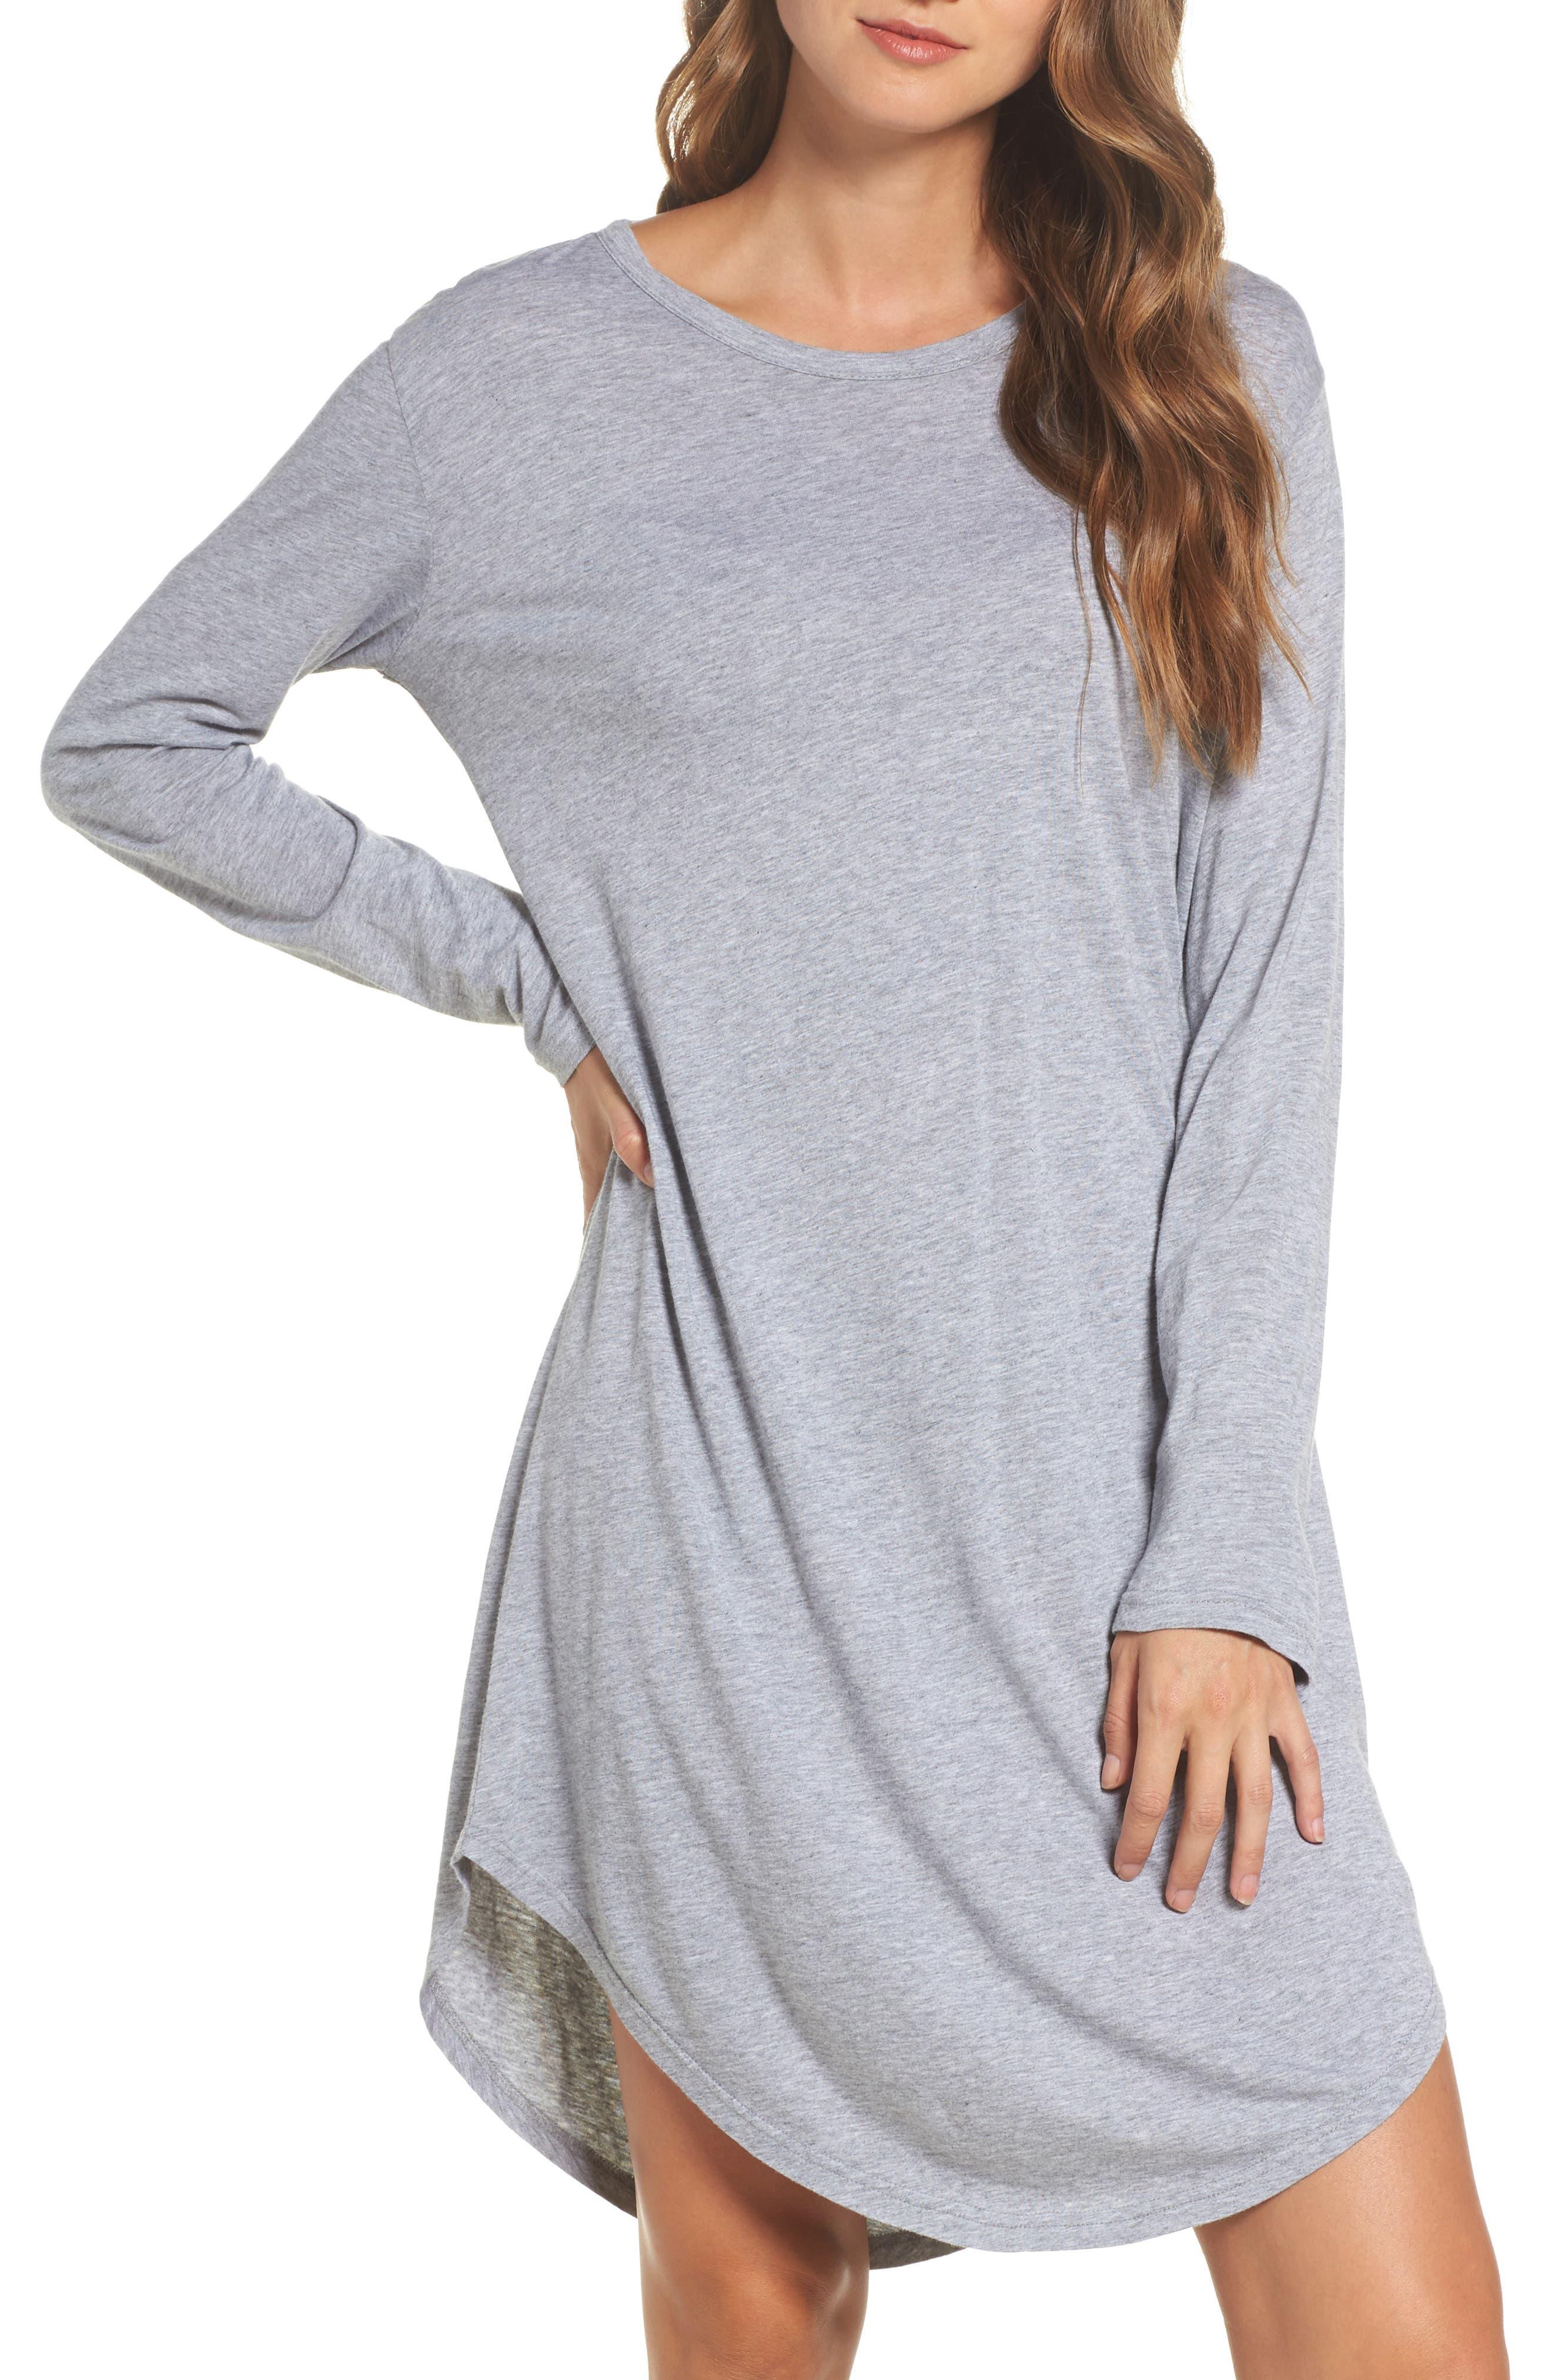 Wednesday Sleep Shirt,                         Main,                         color, Plain Grey Marle